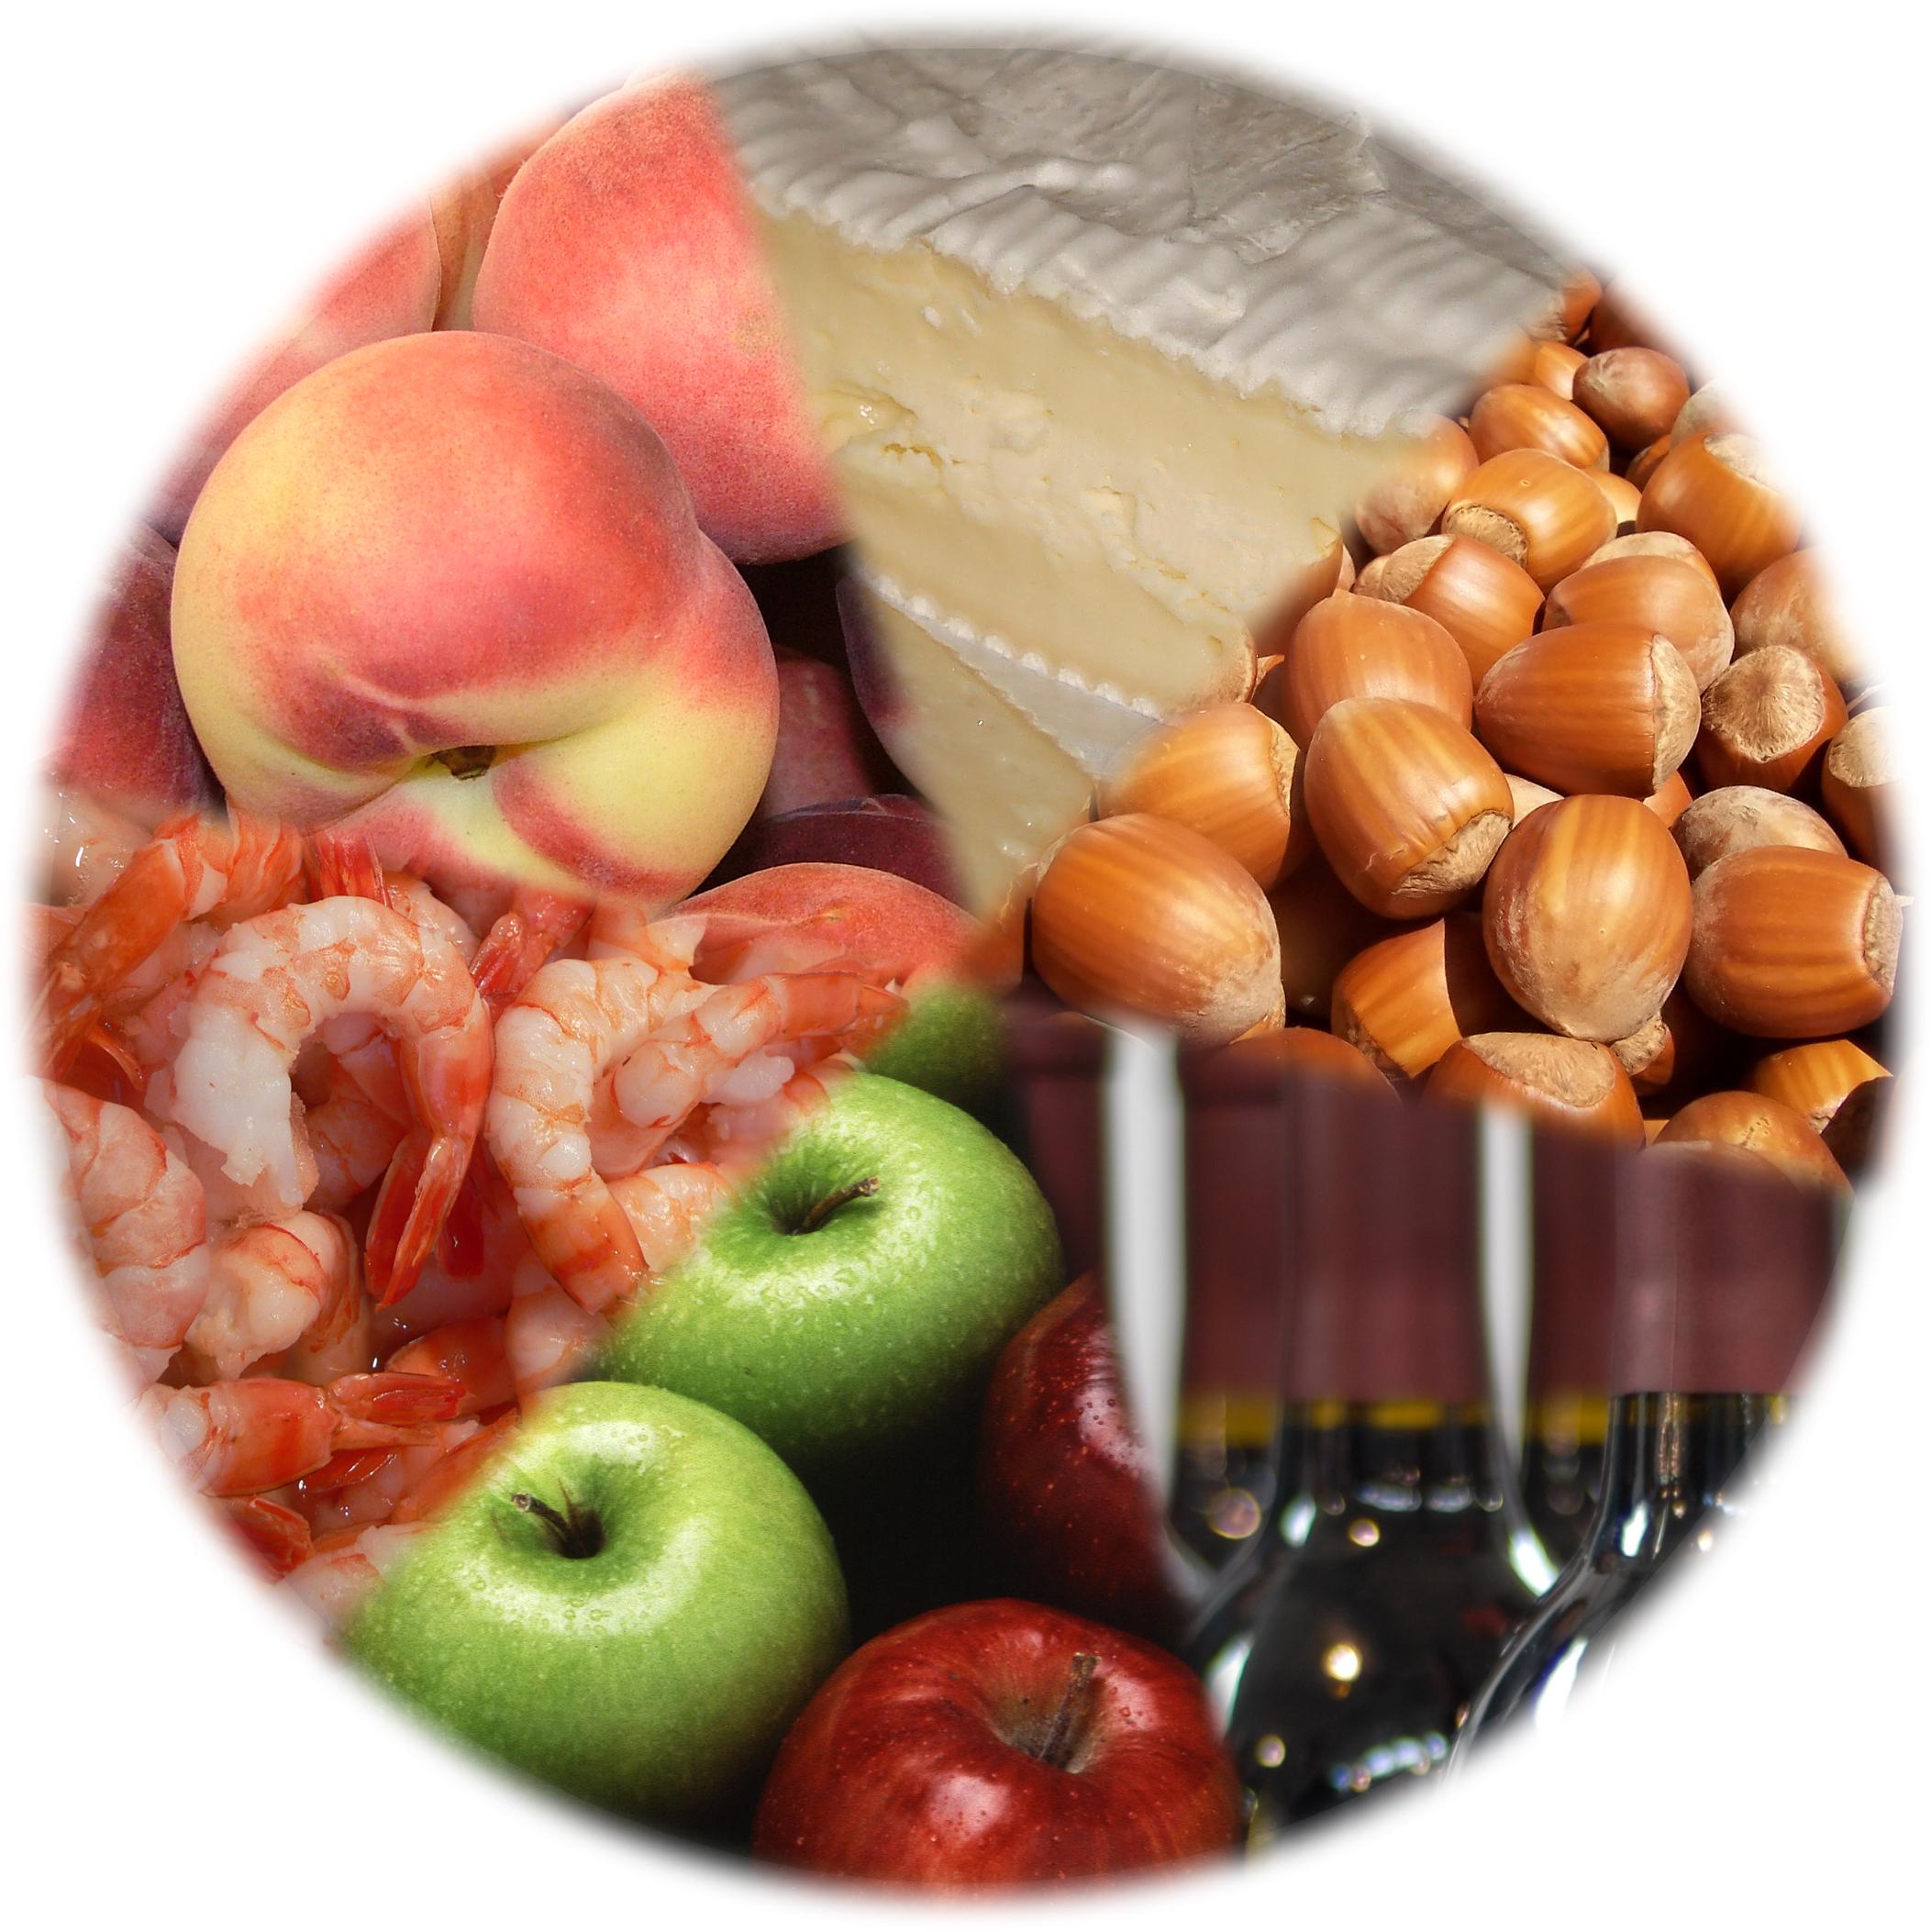 Can A Food Allergy Cause Heartburn